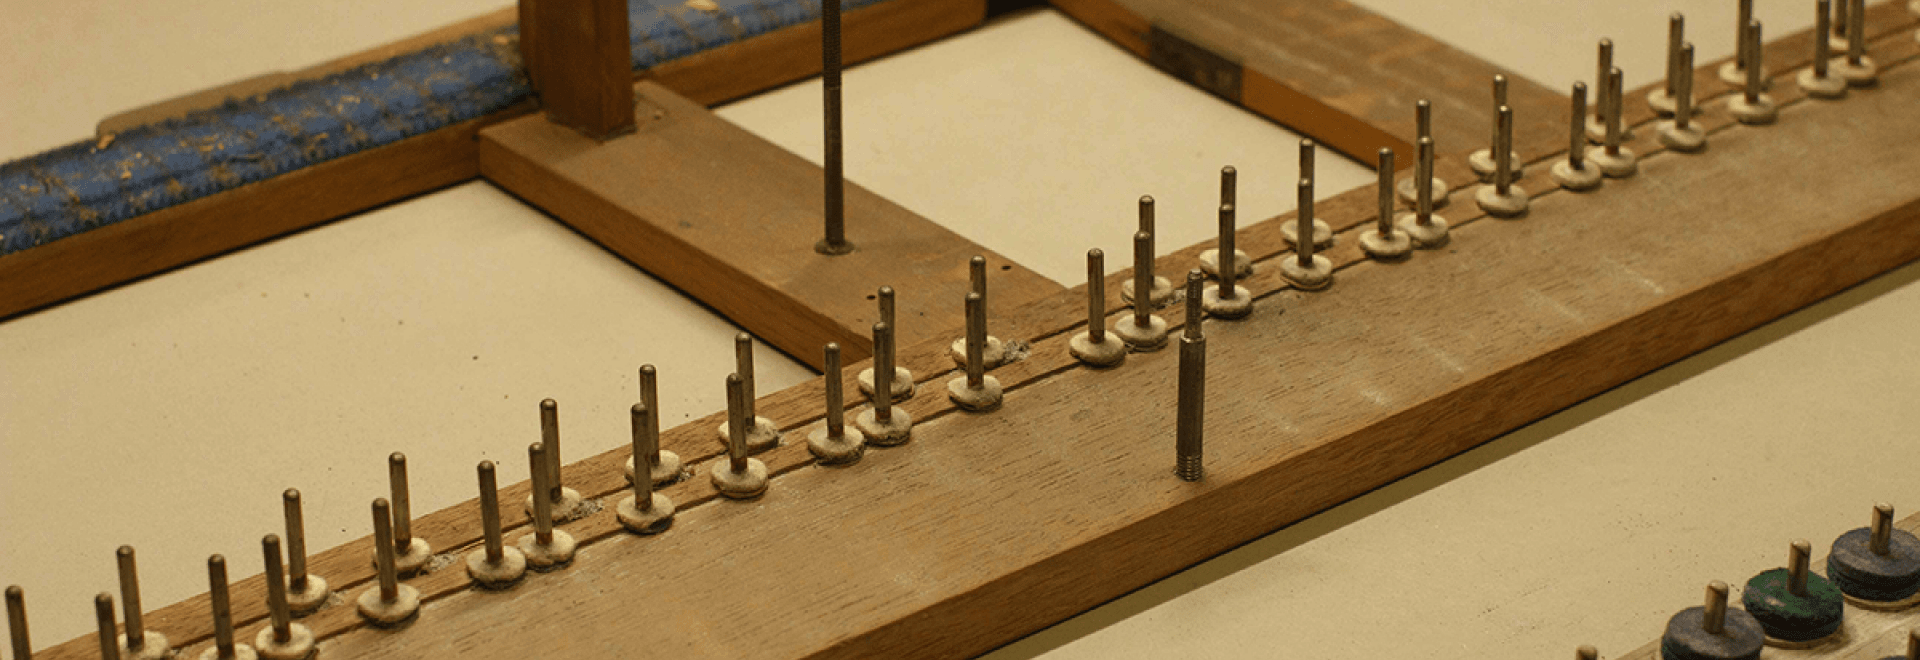 Restauration du piano Pleyel de Peter Benoit